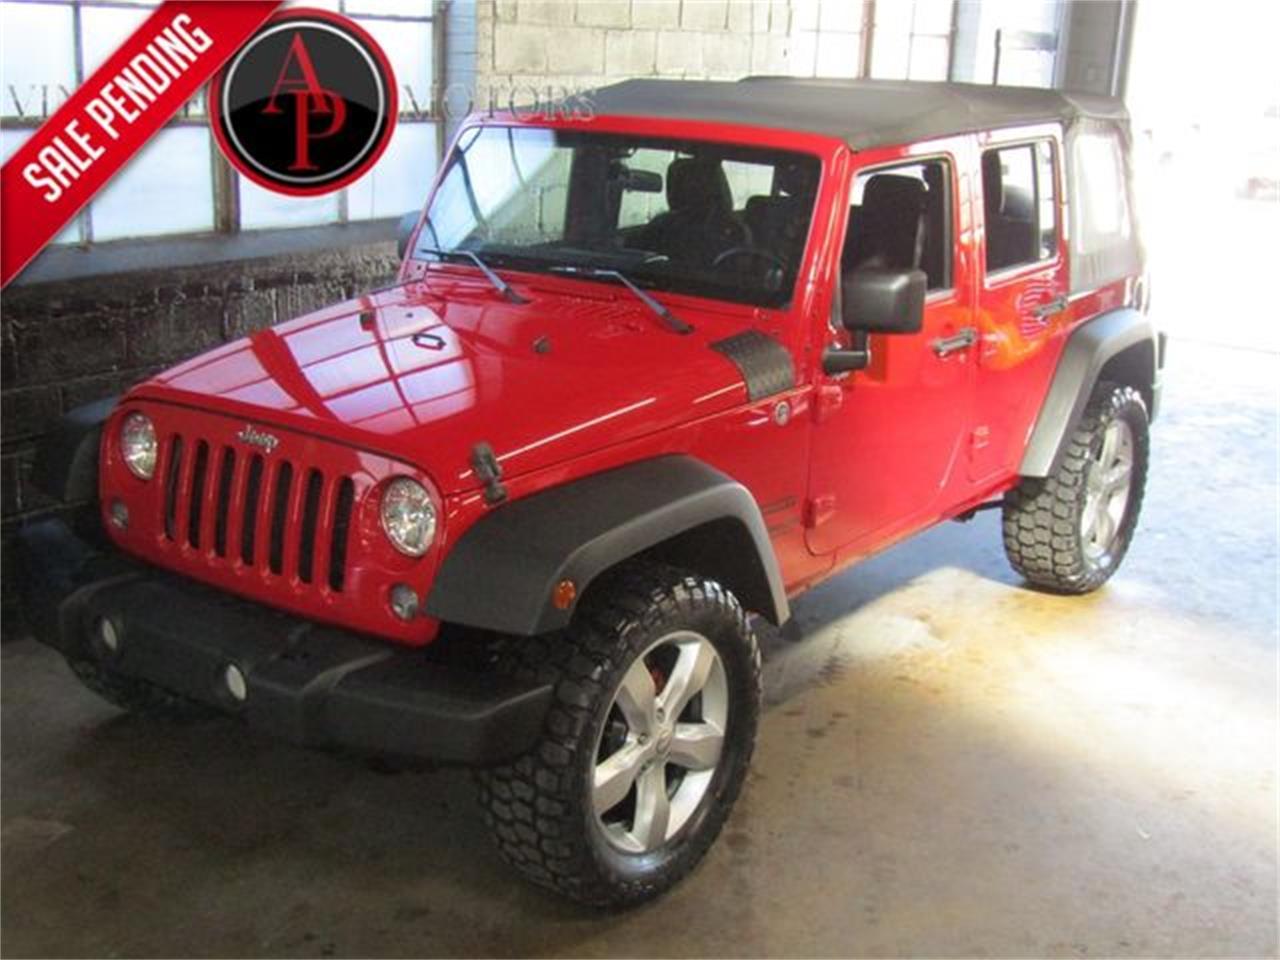 2014 Jeep Wrangler (CC-1272231) for sale in Statesville, North Carolina